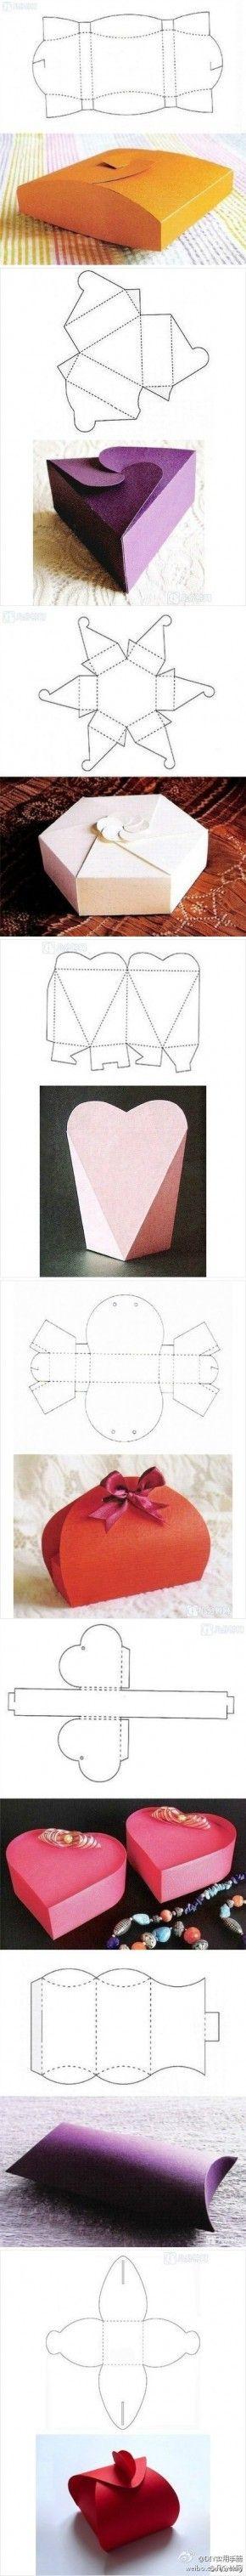 Fold your own gift-box! / Zelf mooie doosjes vouwen